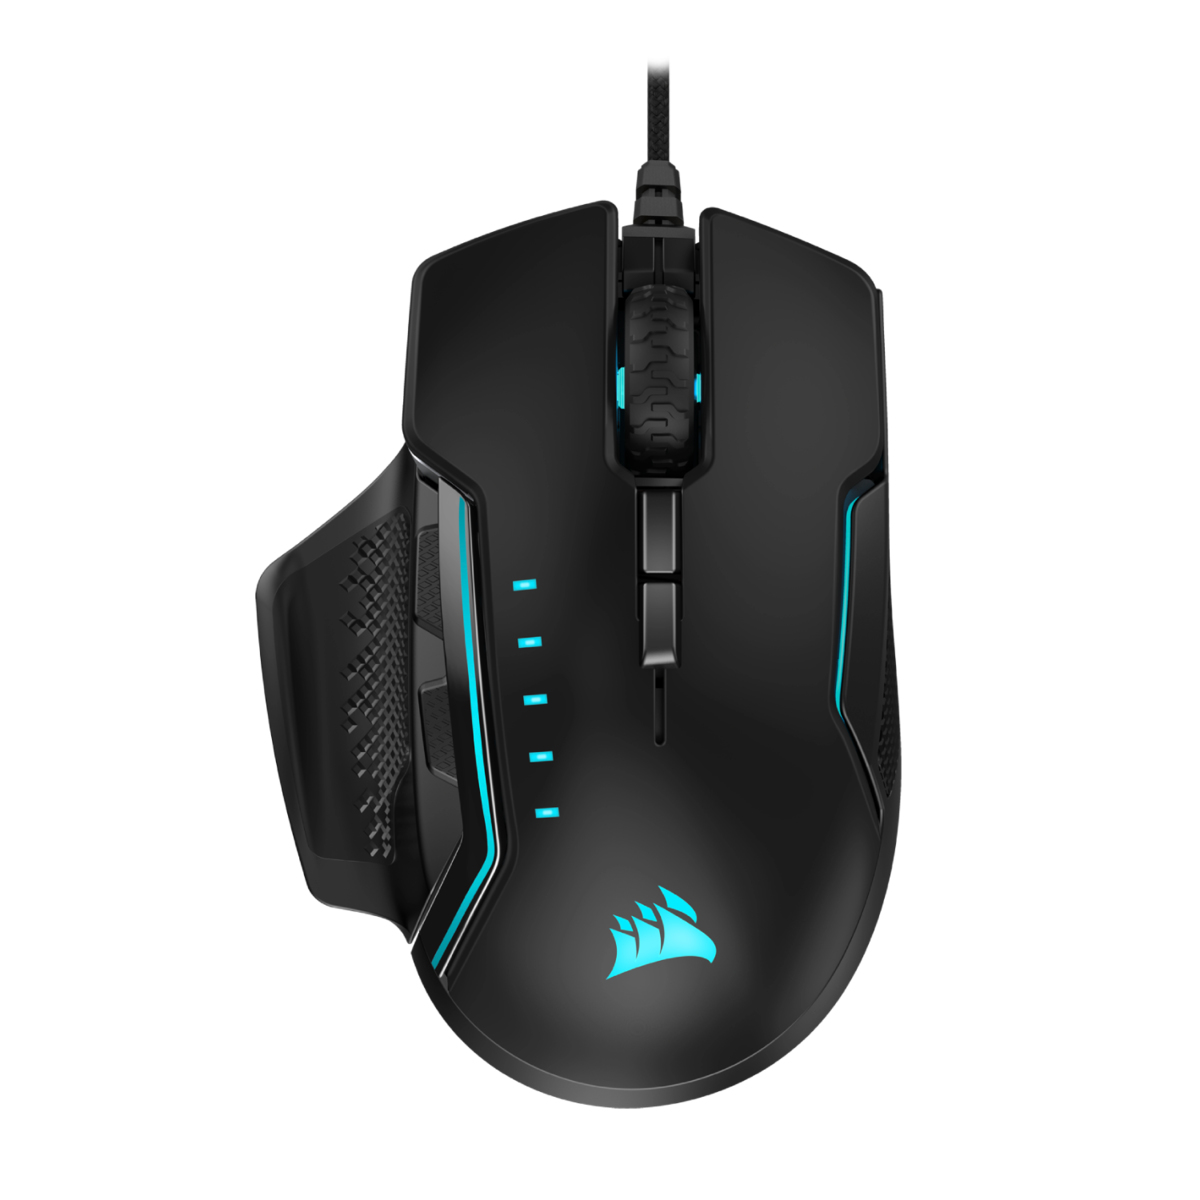 Corsaiar Glaive RGB Pro Aluminum Gaming Mouse